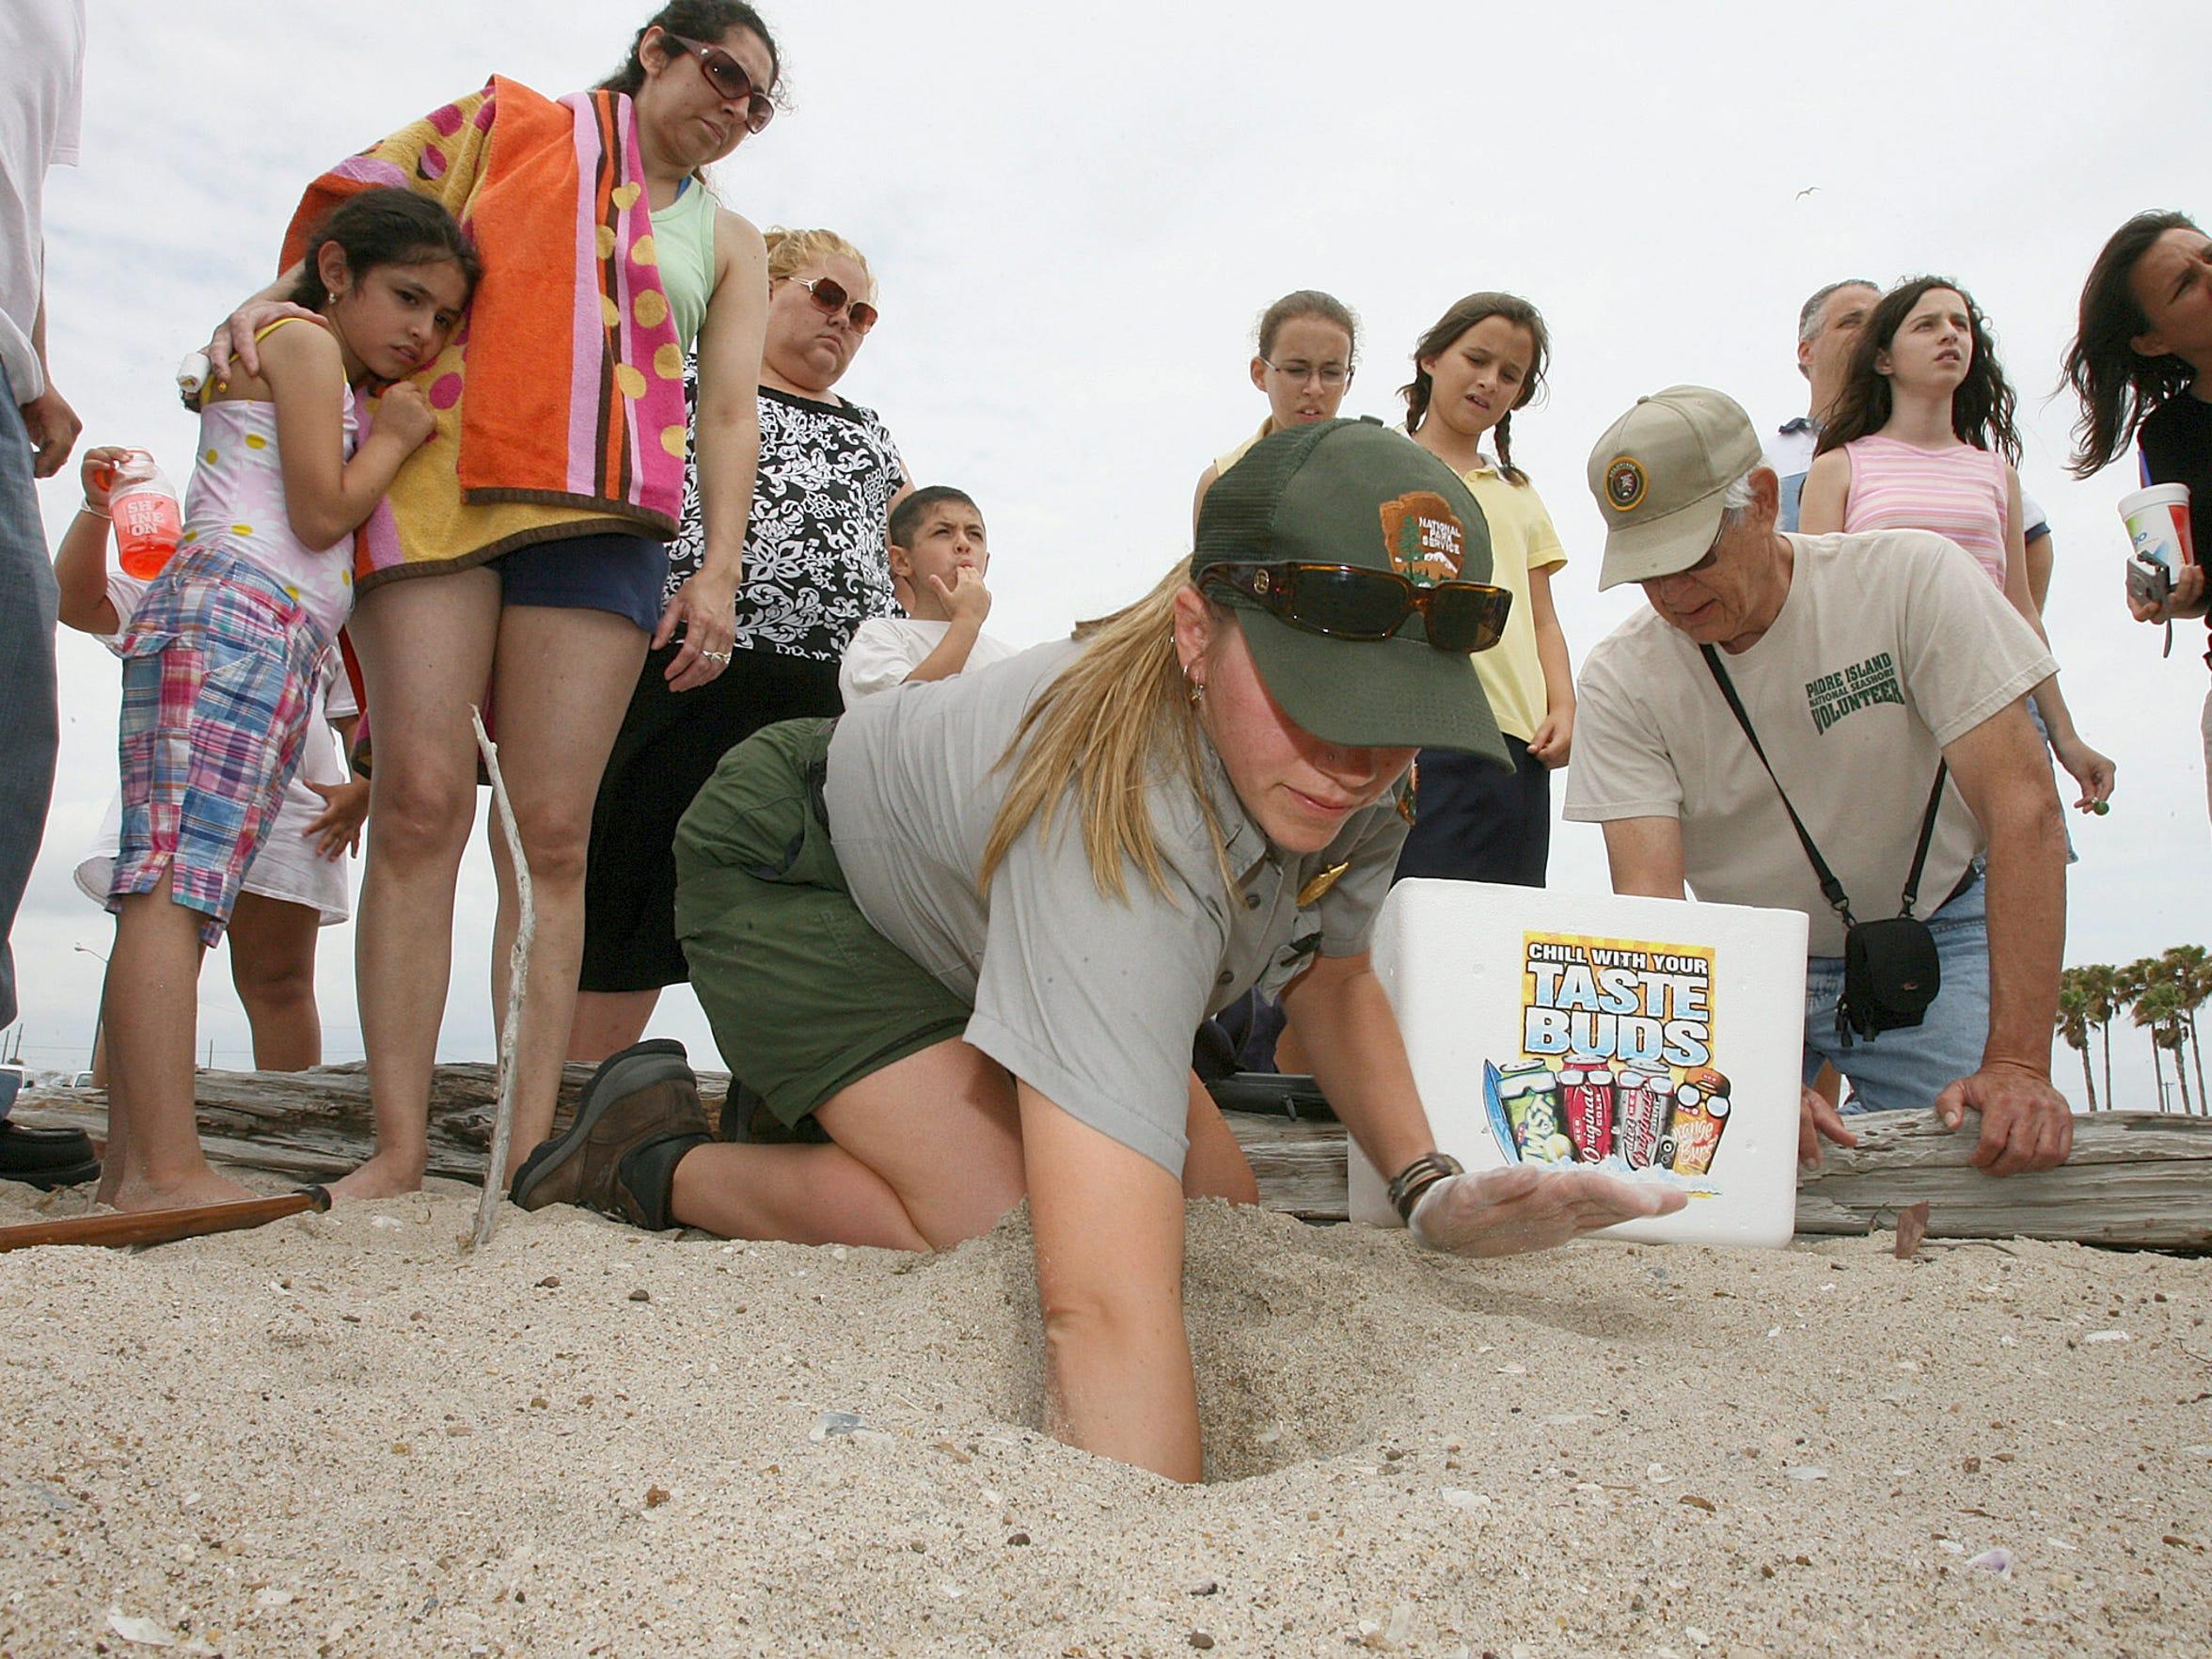 Beach goers on North Beach gather around to watch a